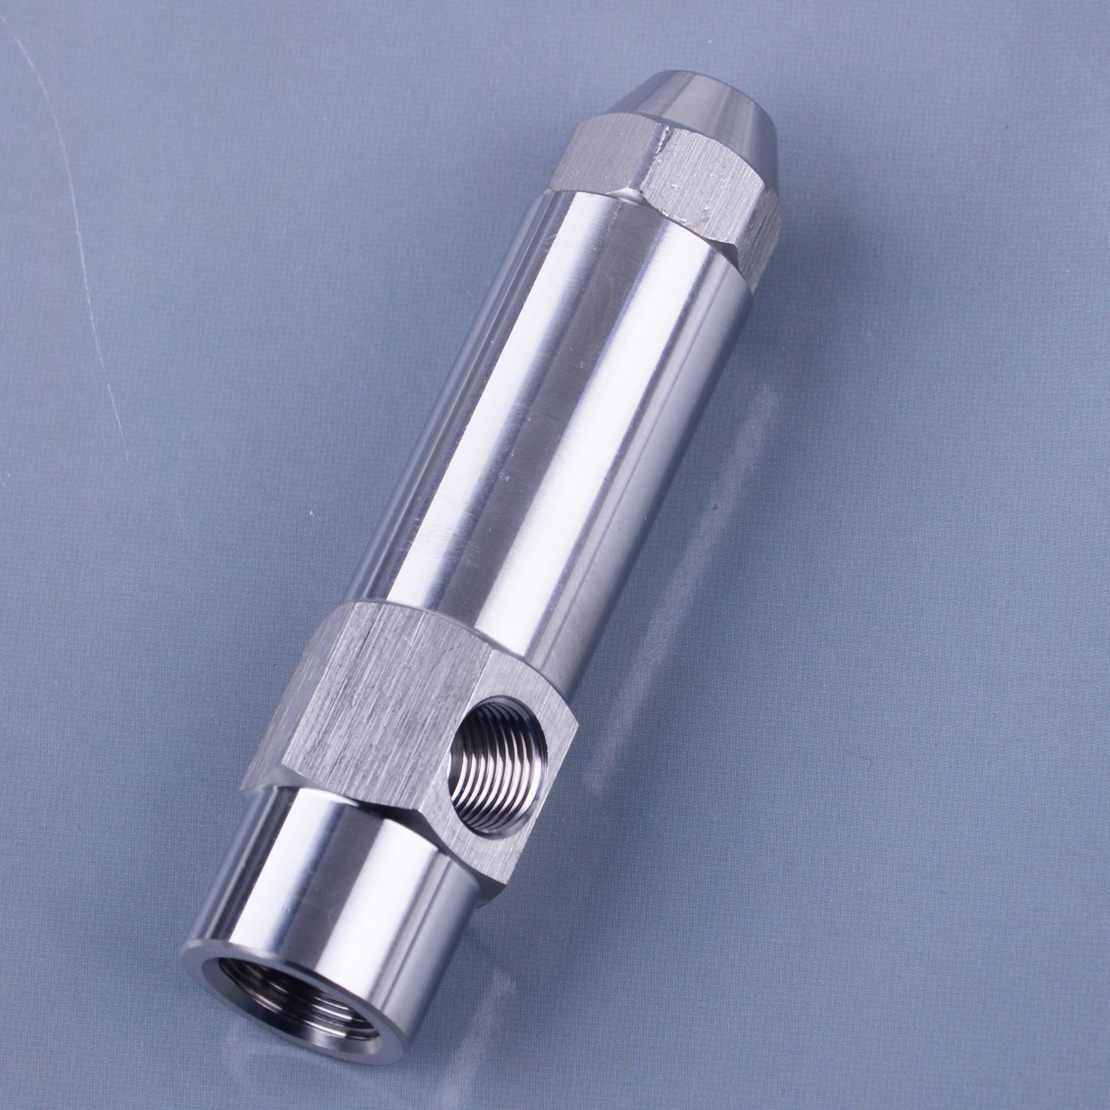 все цены на LETAOSK 1mm Stainless Steel Fuel Burner Spray Nozzle Diesel Heavy Waste Oil Alcohol-Based Atomization Burner Nozzle